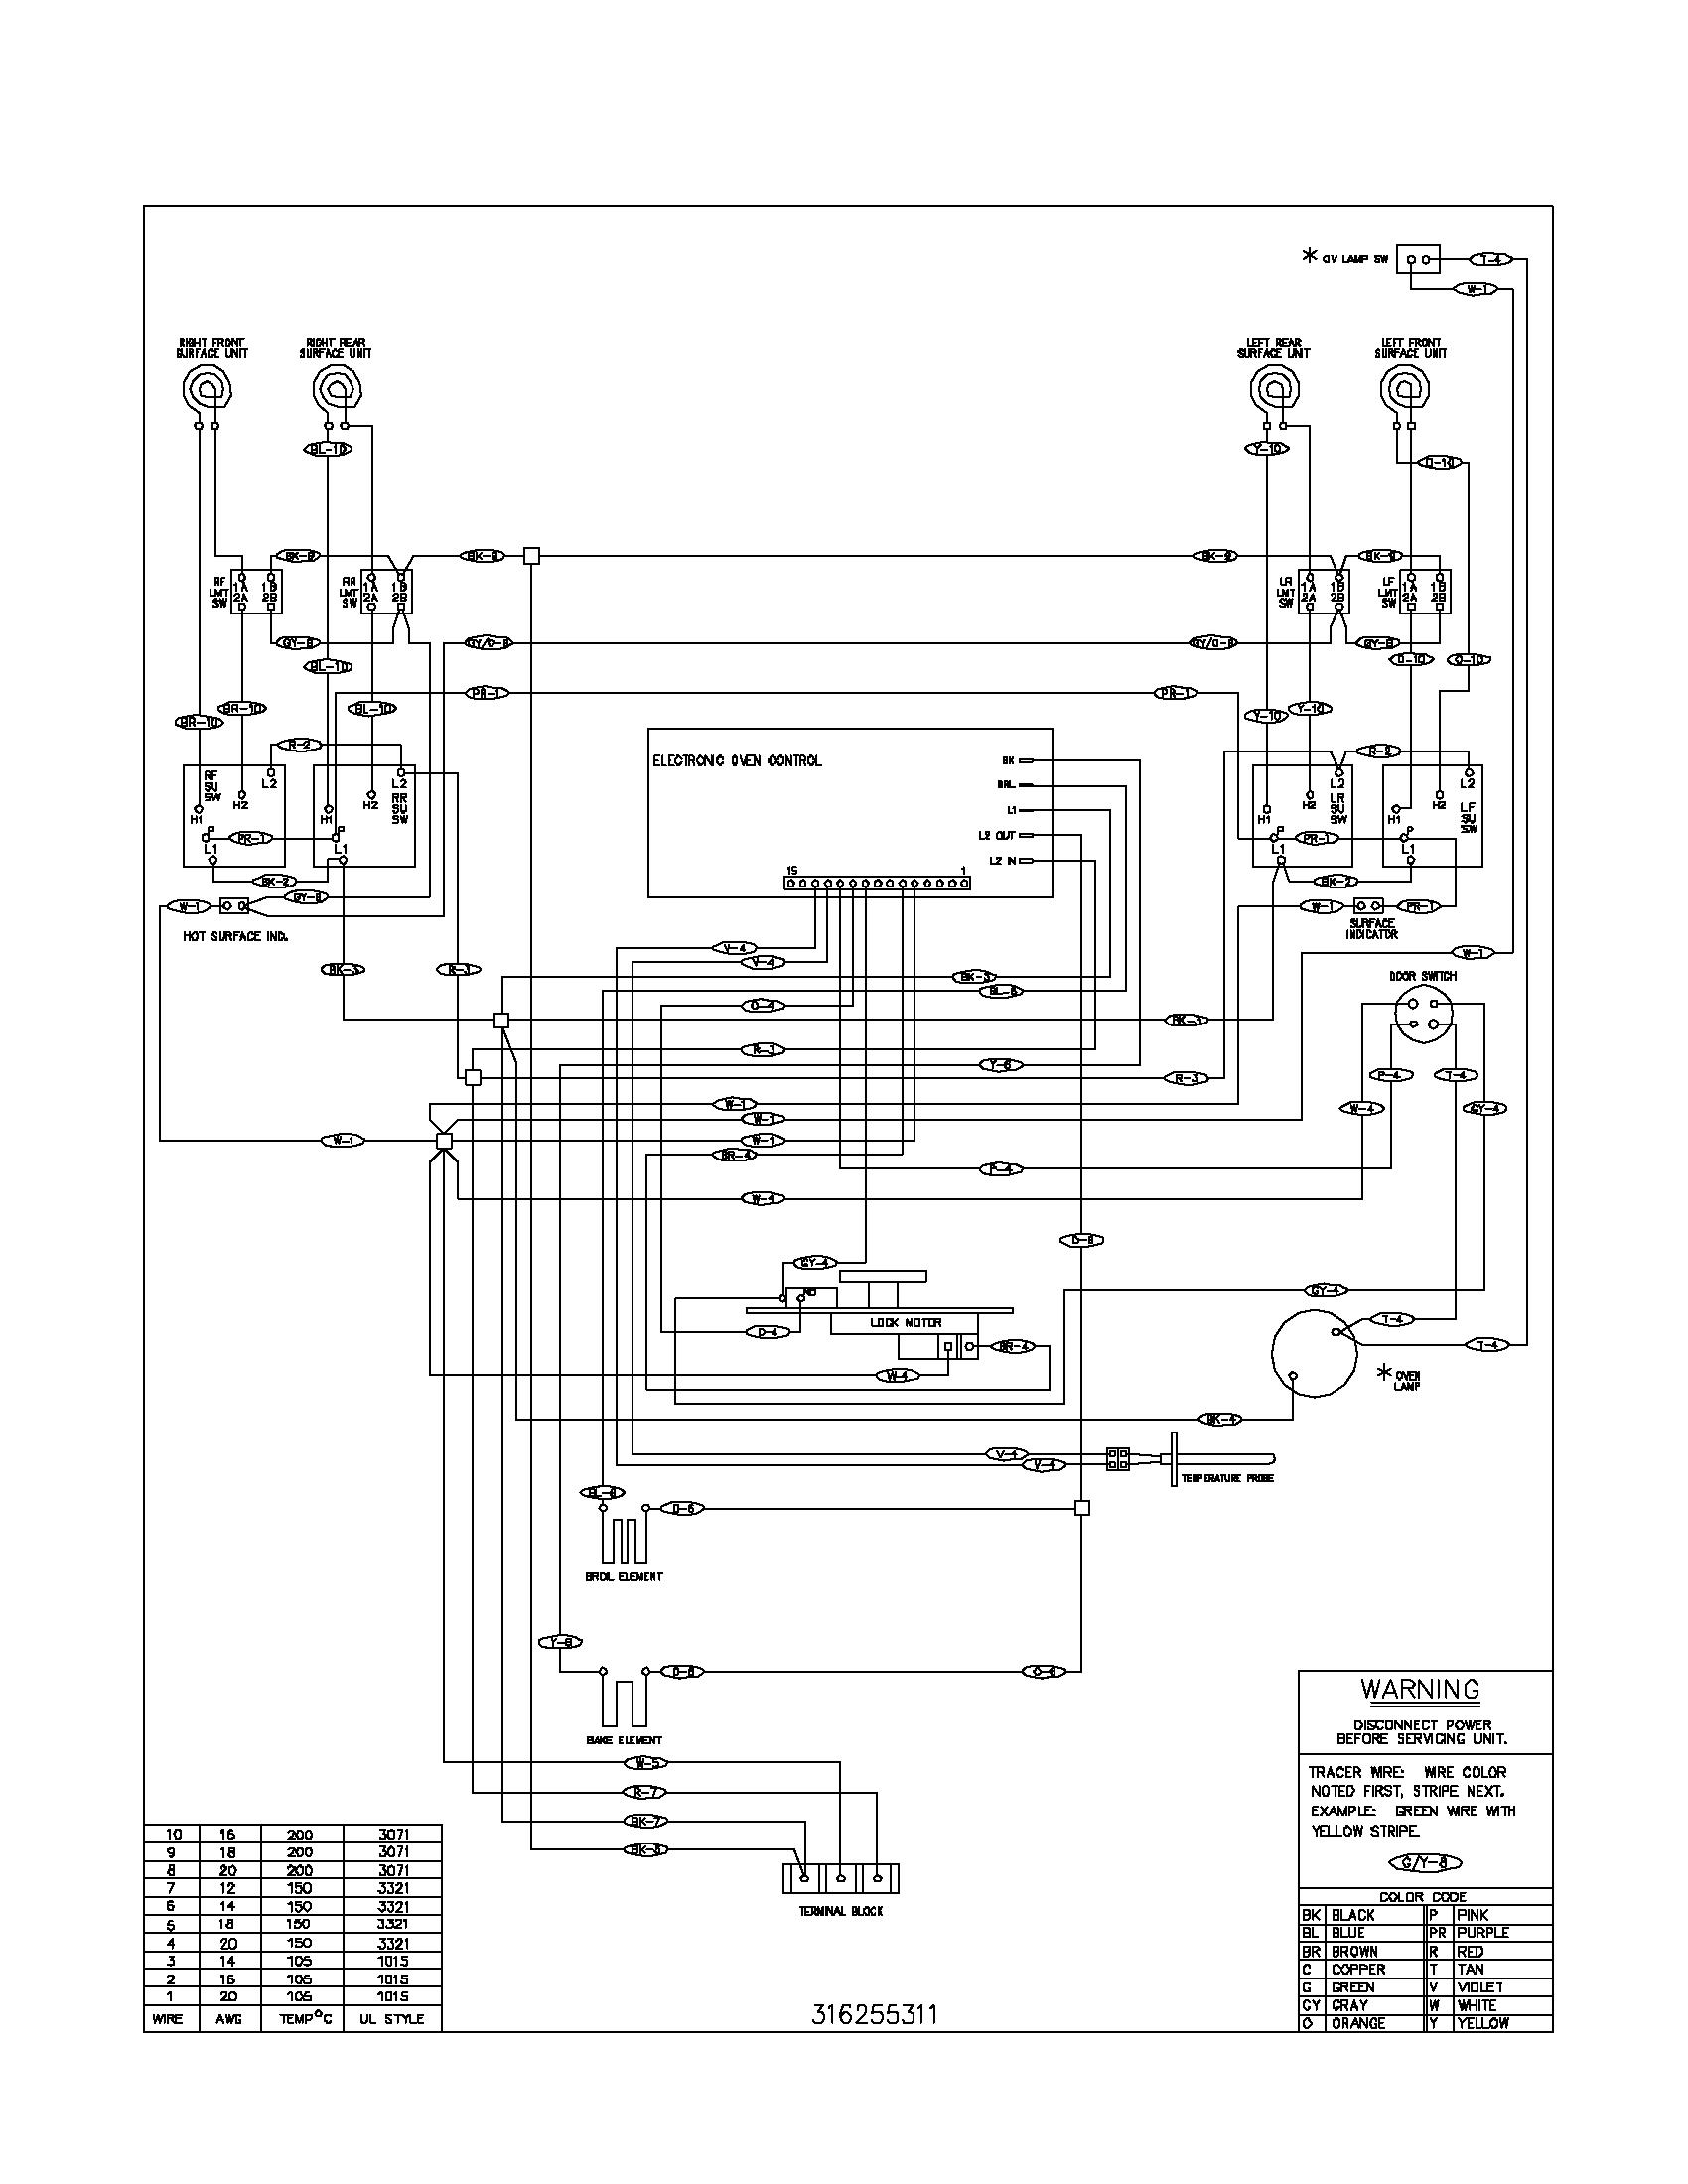 Unique Wiring Diagram Of Electric Cooker Diagram